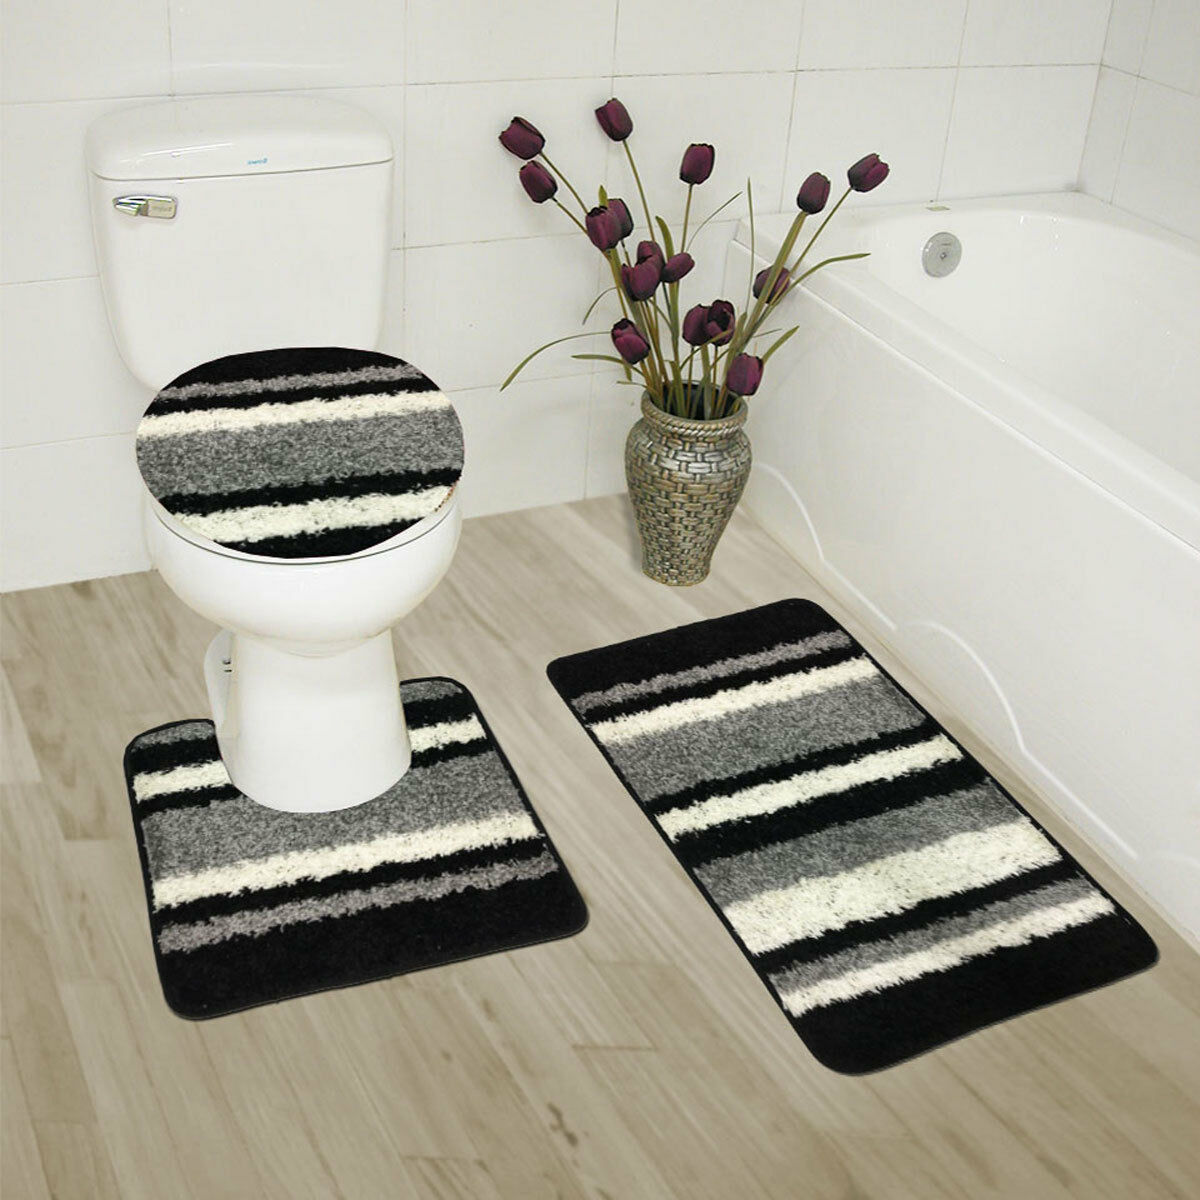 Abby 3 Piece Bathroom Rug Set Bath Rug Contour Rug Lid Cover Stripe Black